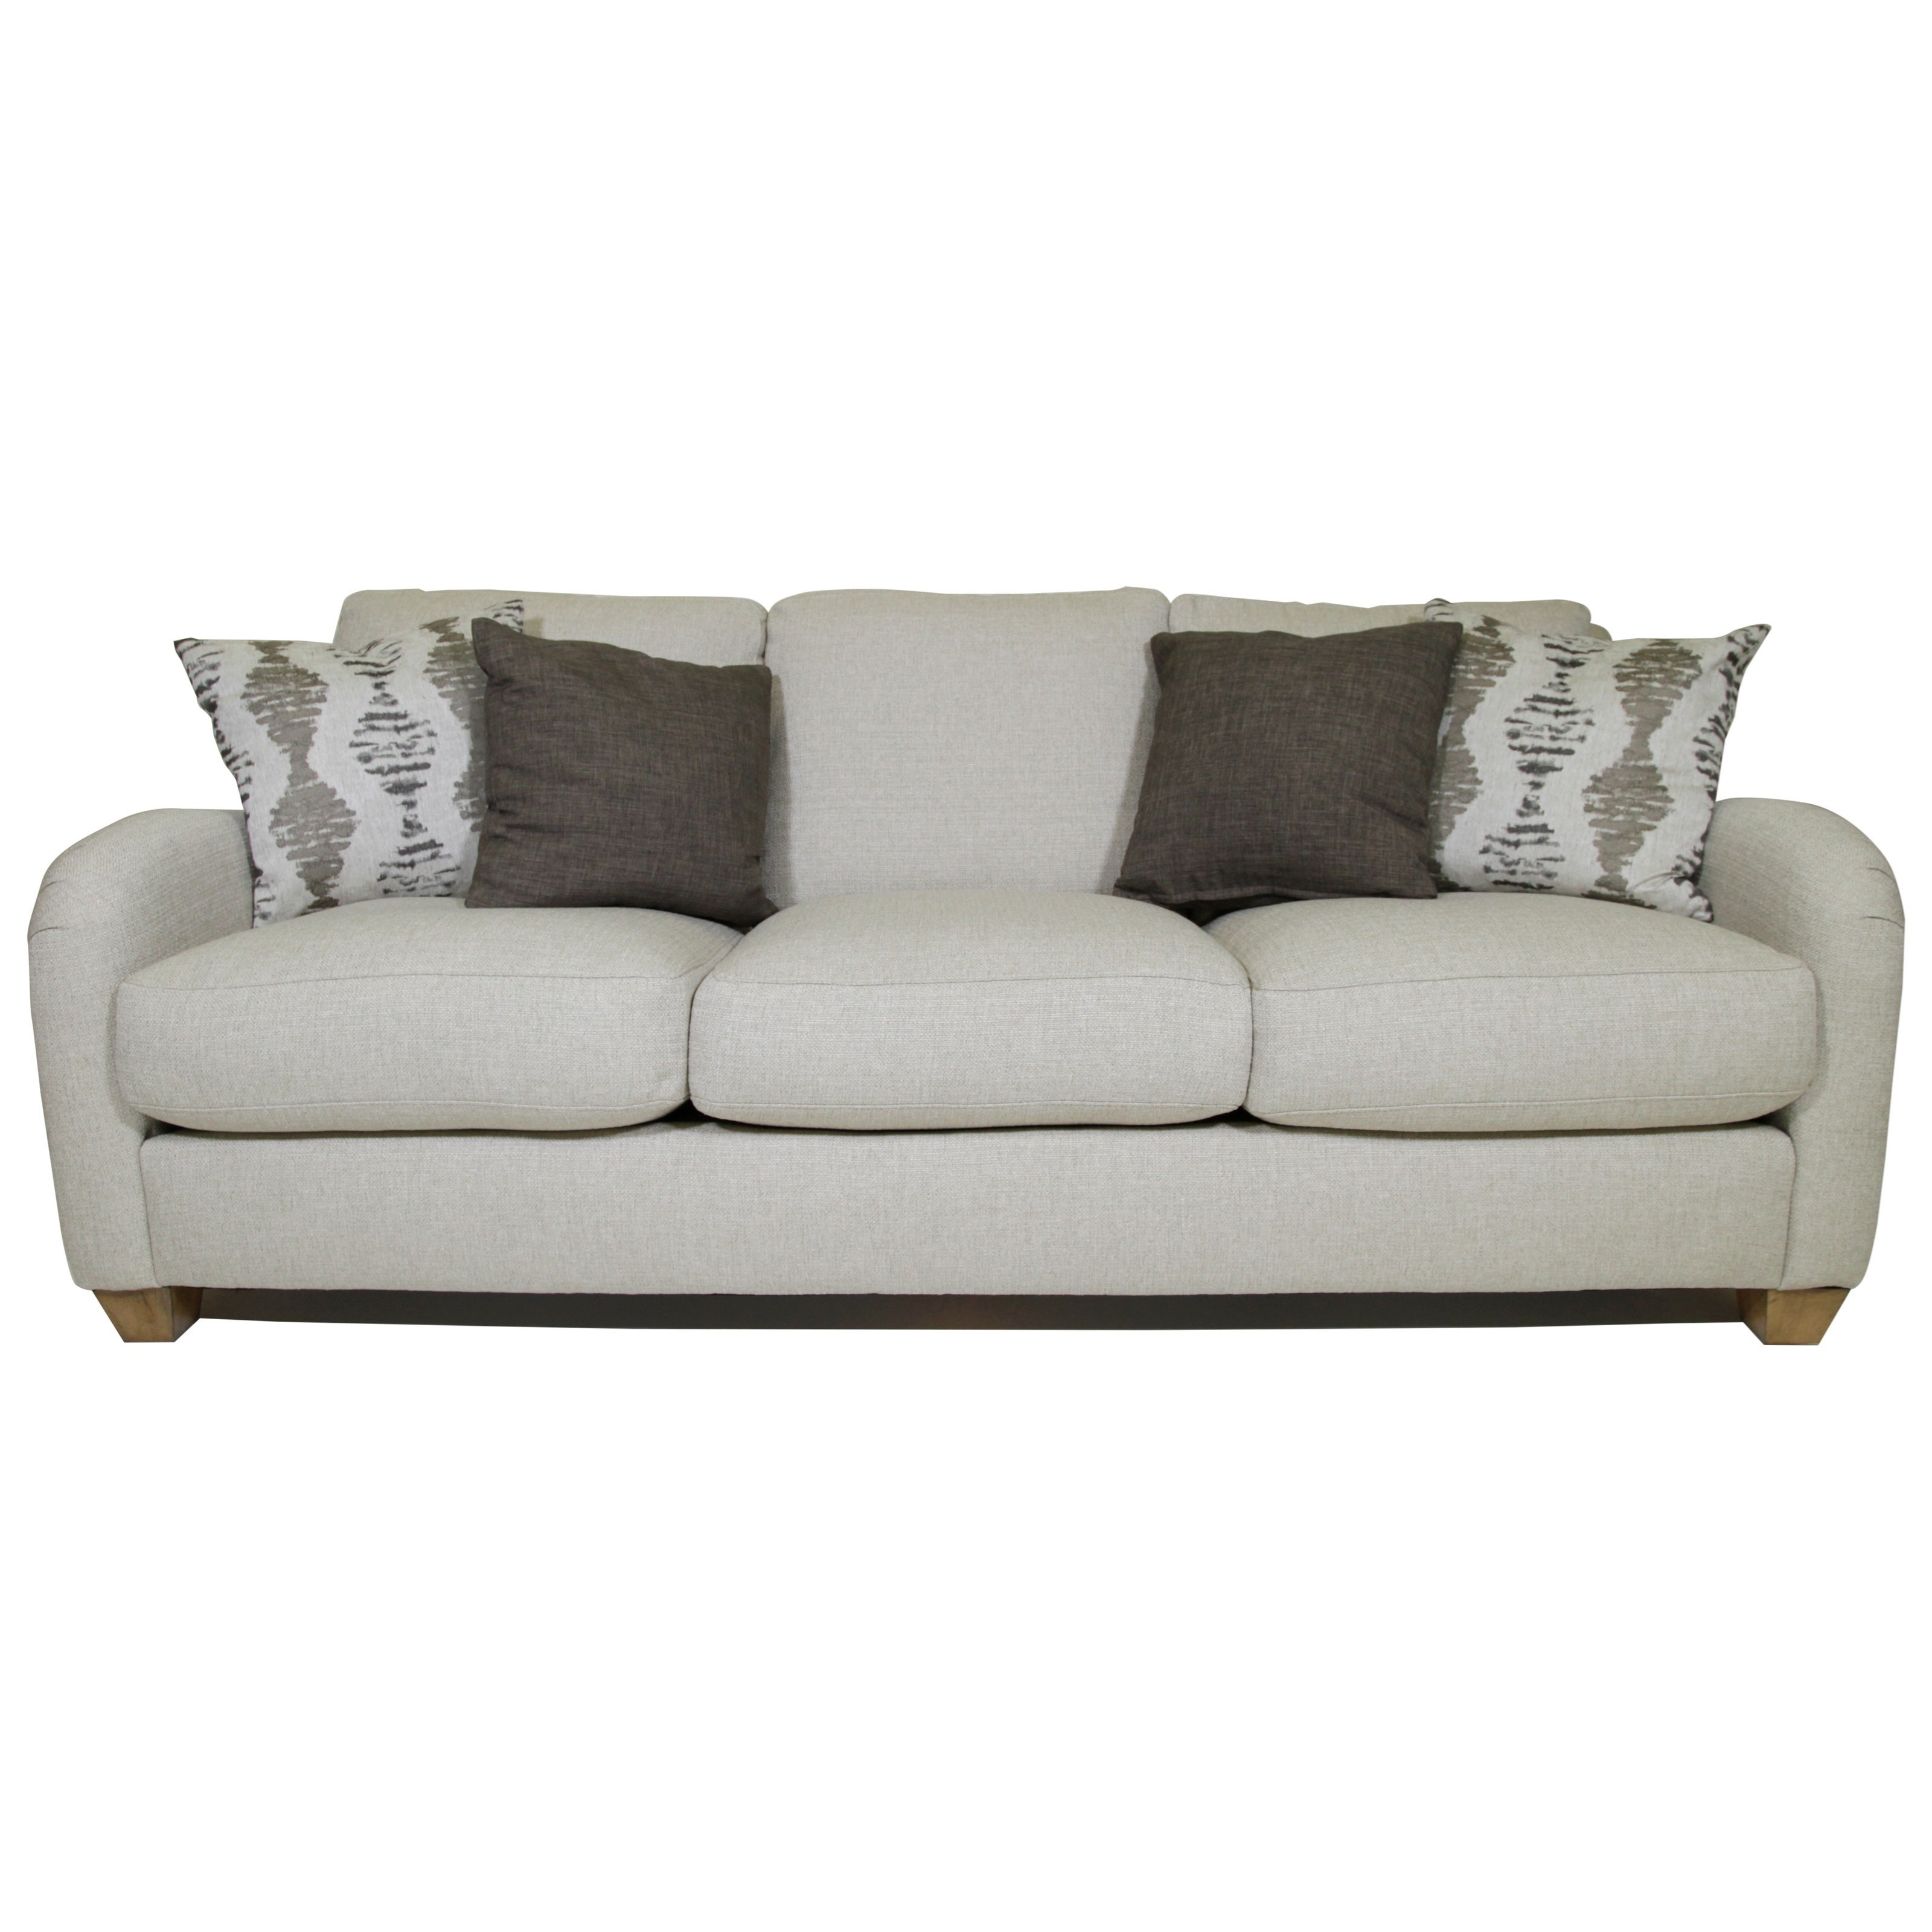 Flexsteel Fortuna Sofa - Item Number: 7908-31-145-11